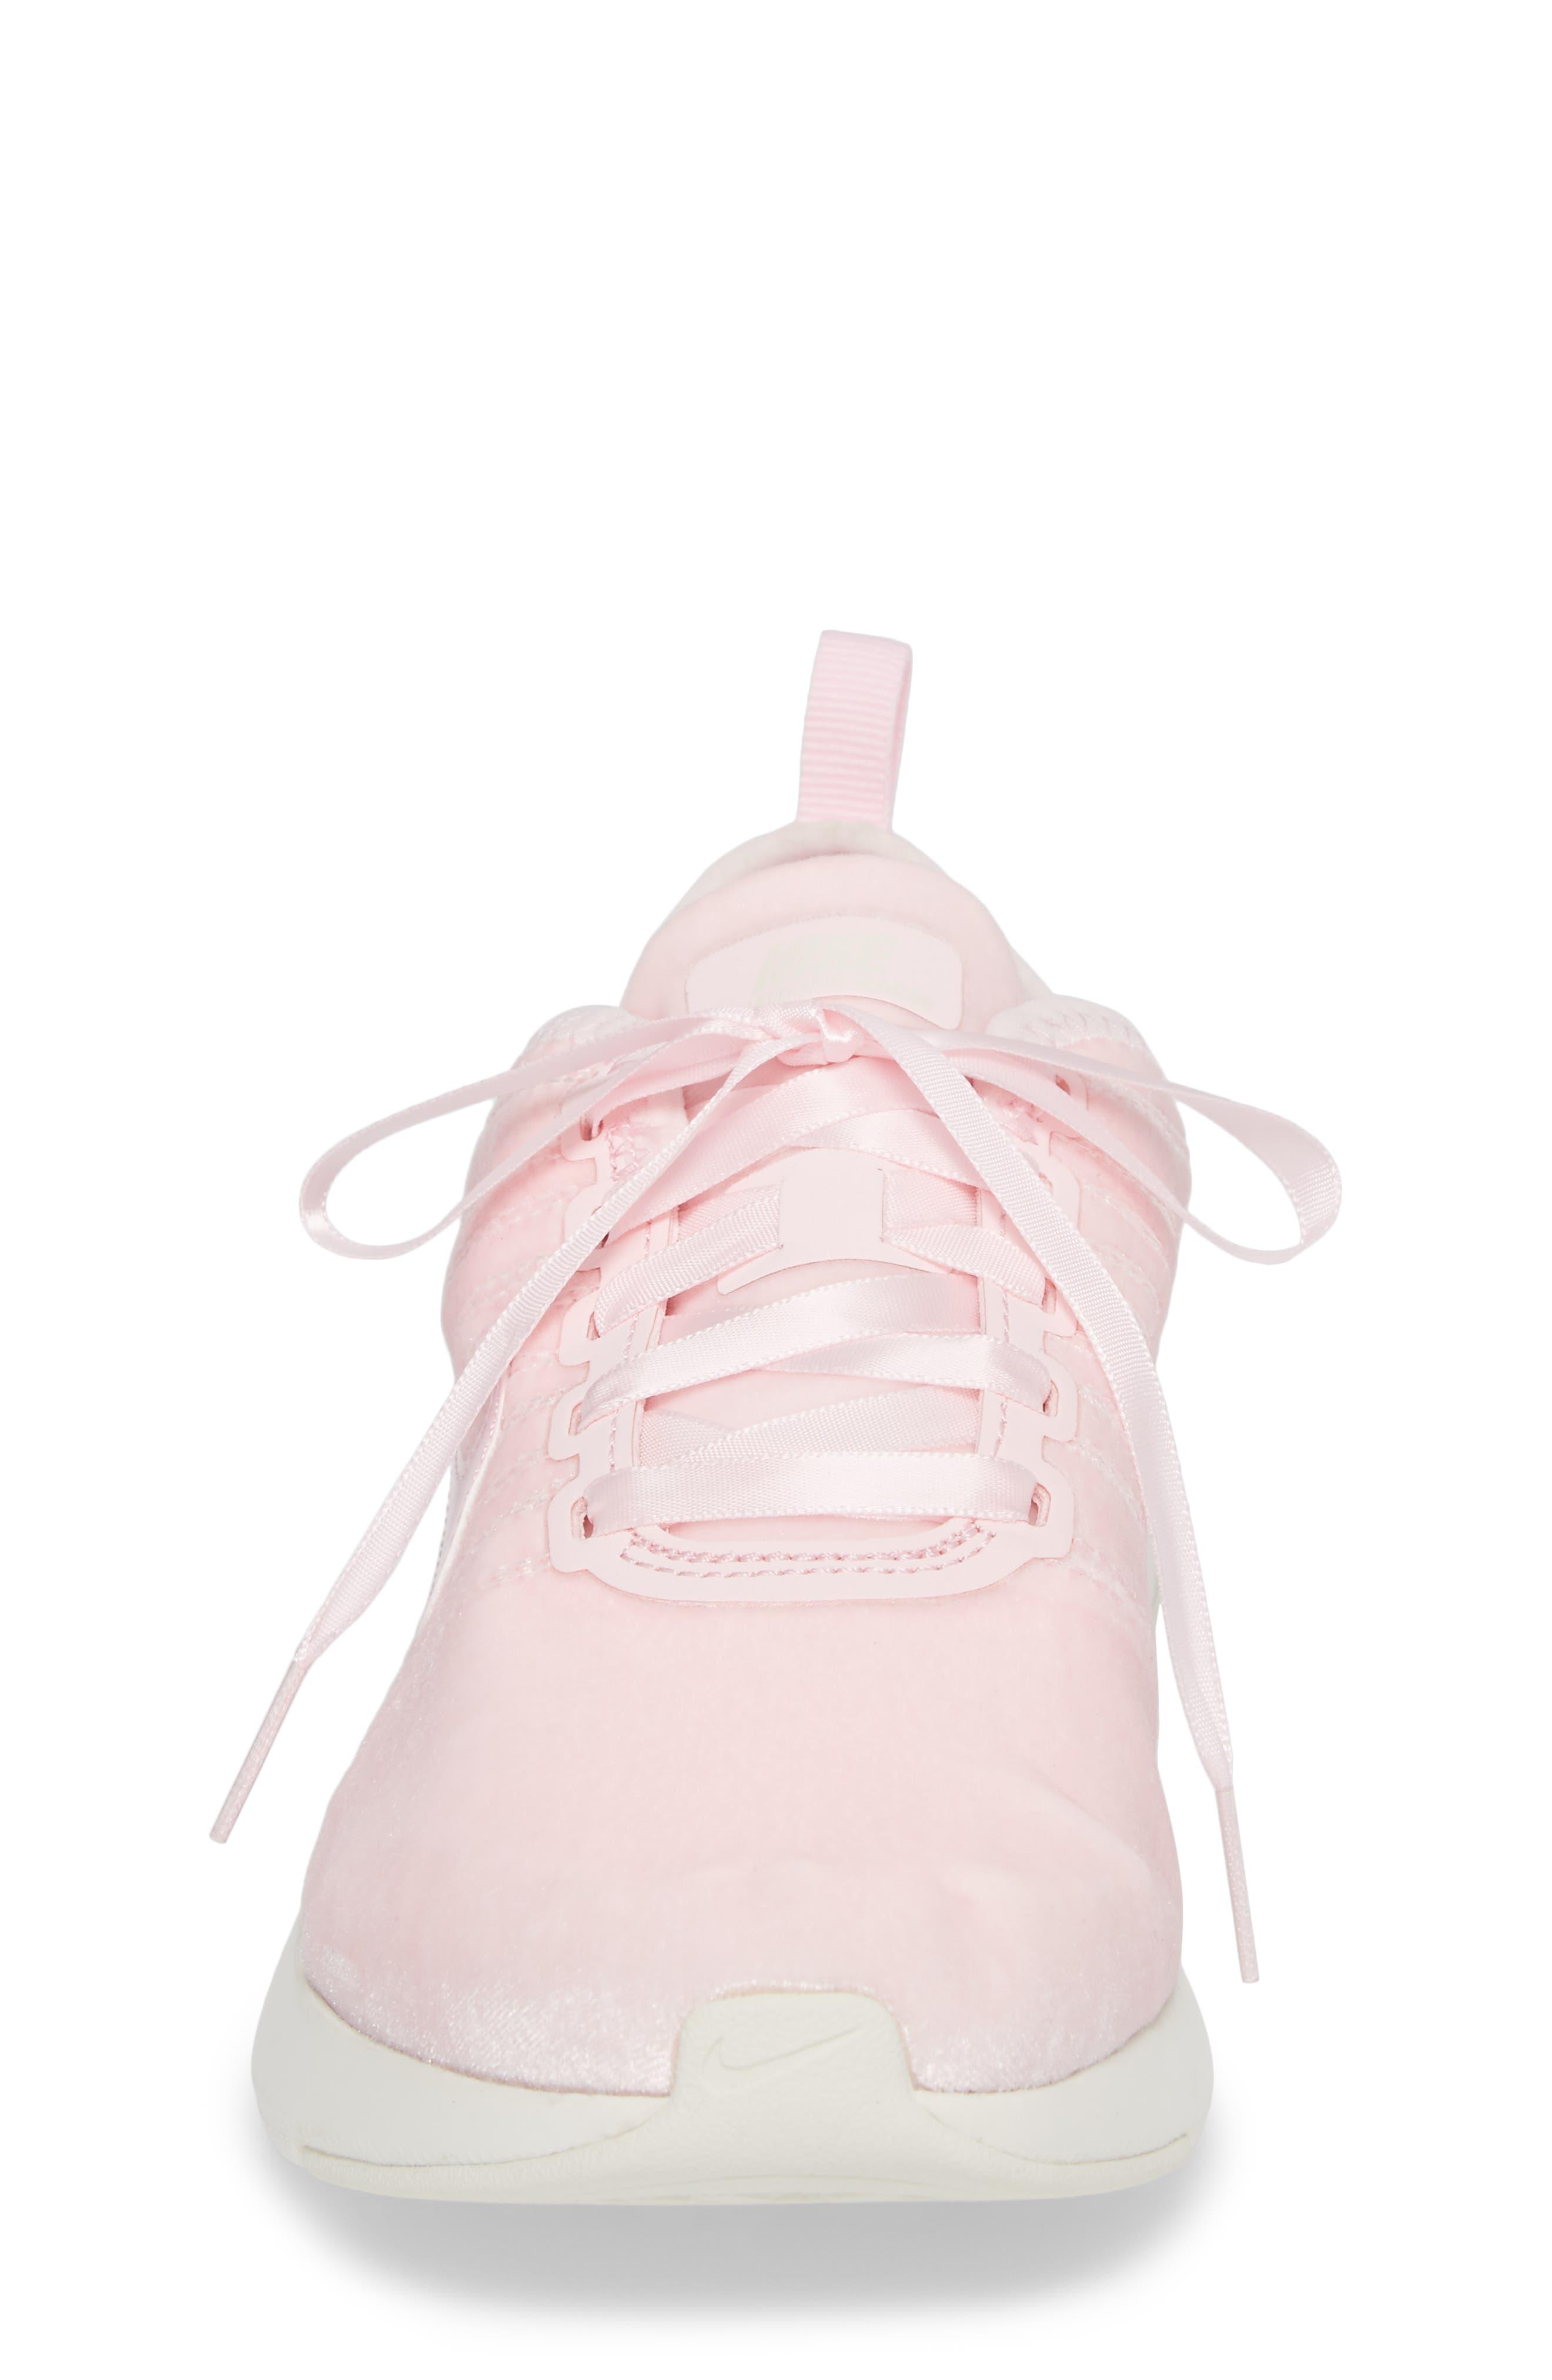 Dualtone Racer SE Sneaker,                             Alternate thumbnail 4, color,                             Arctic Pink/ Arctic Pink/ Sail